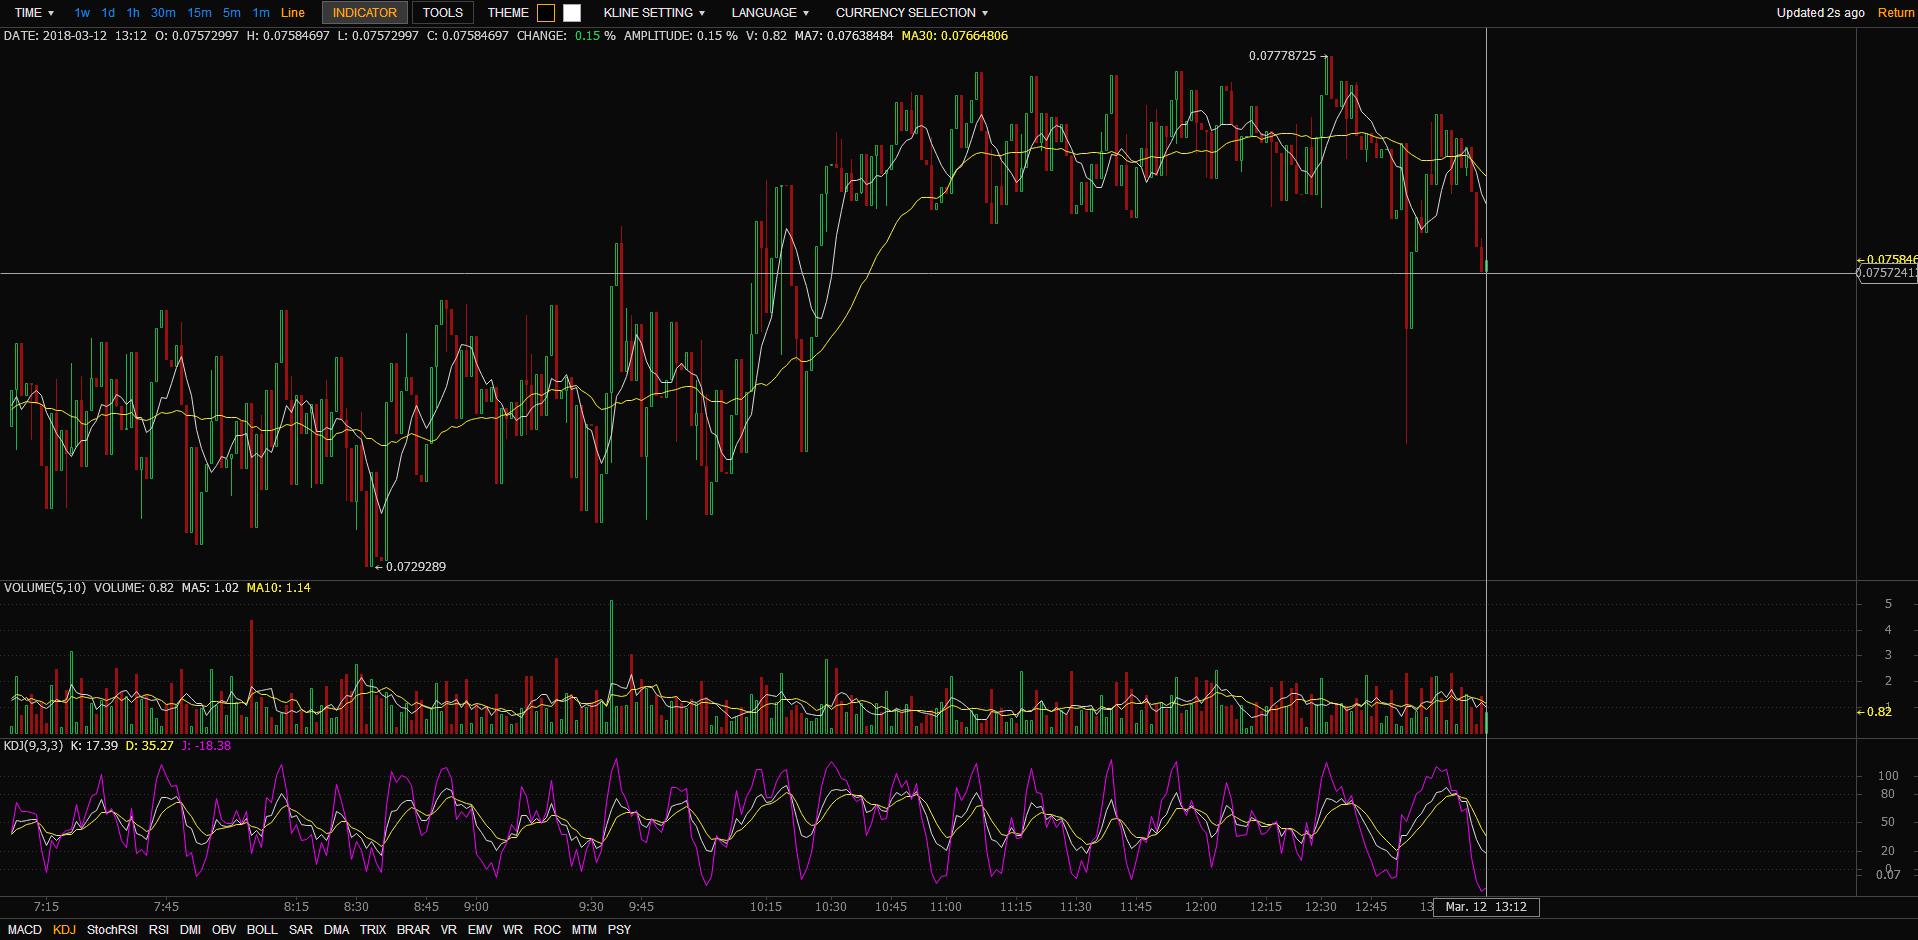 TOPBTC Trading View